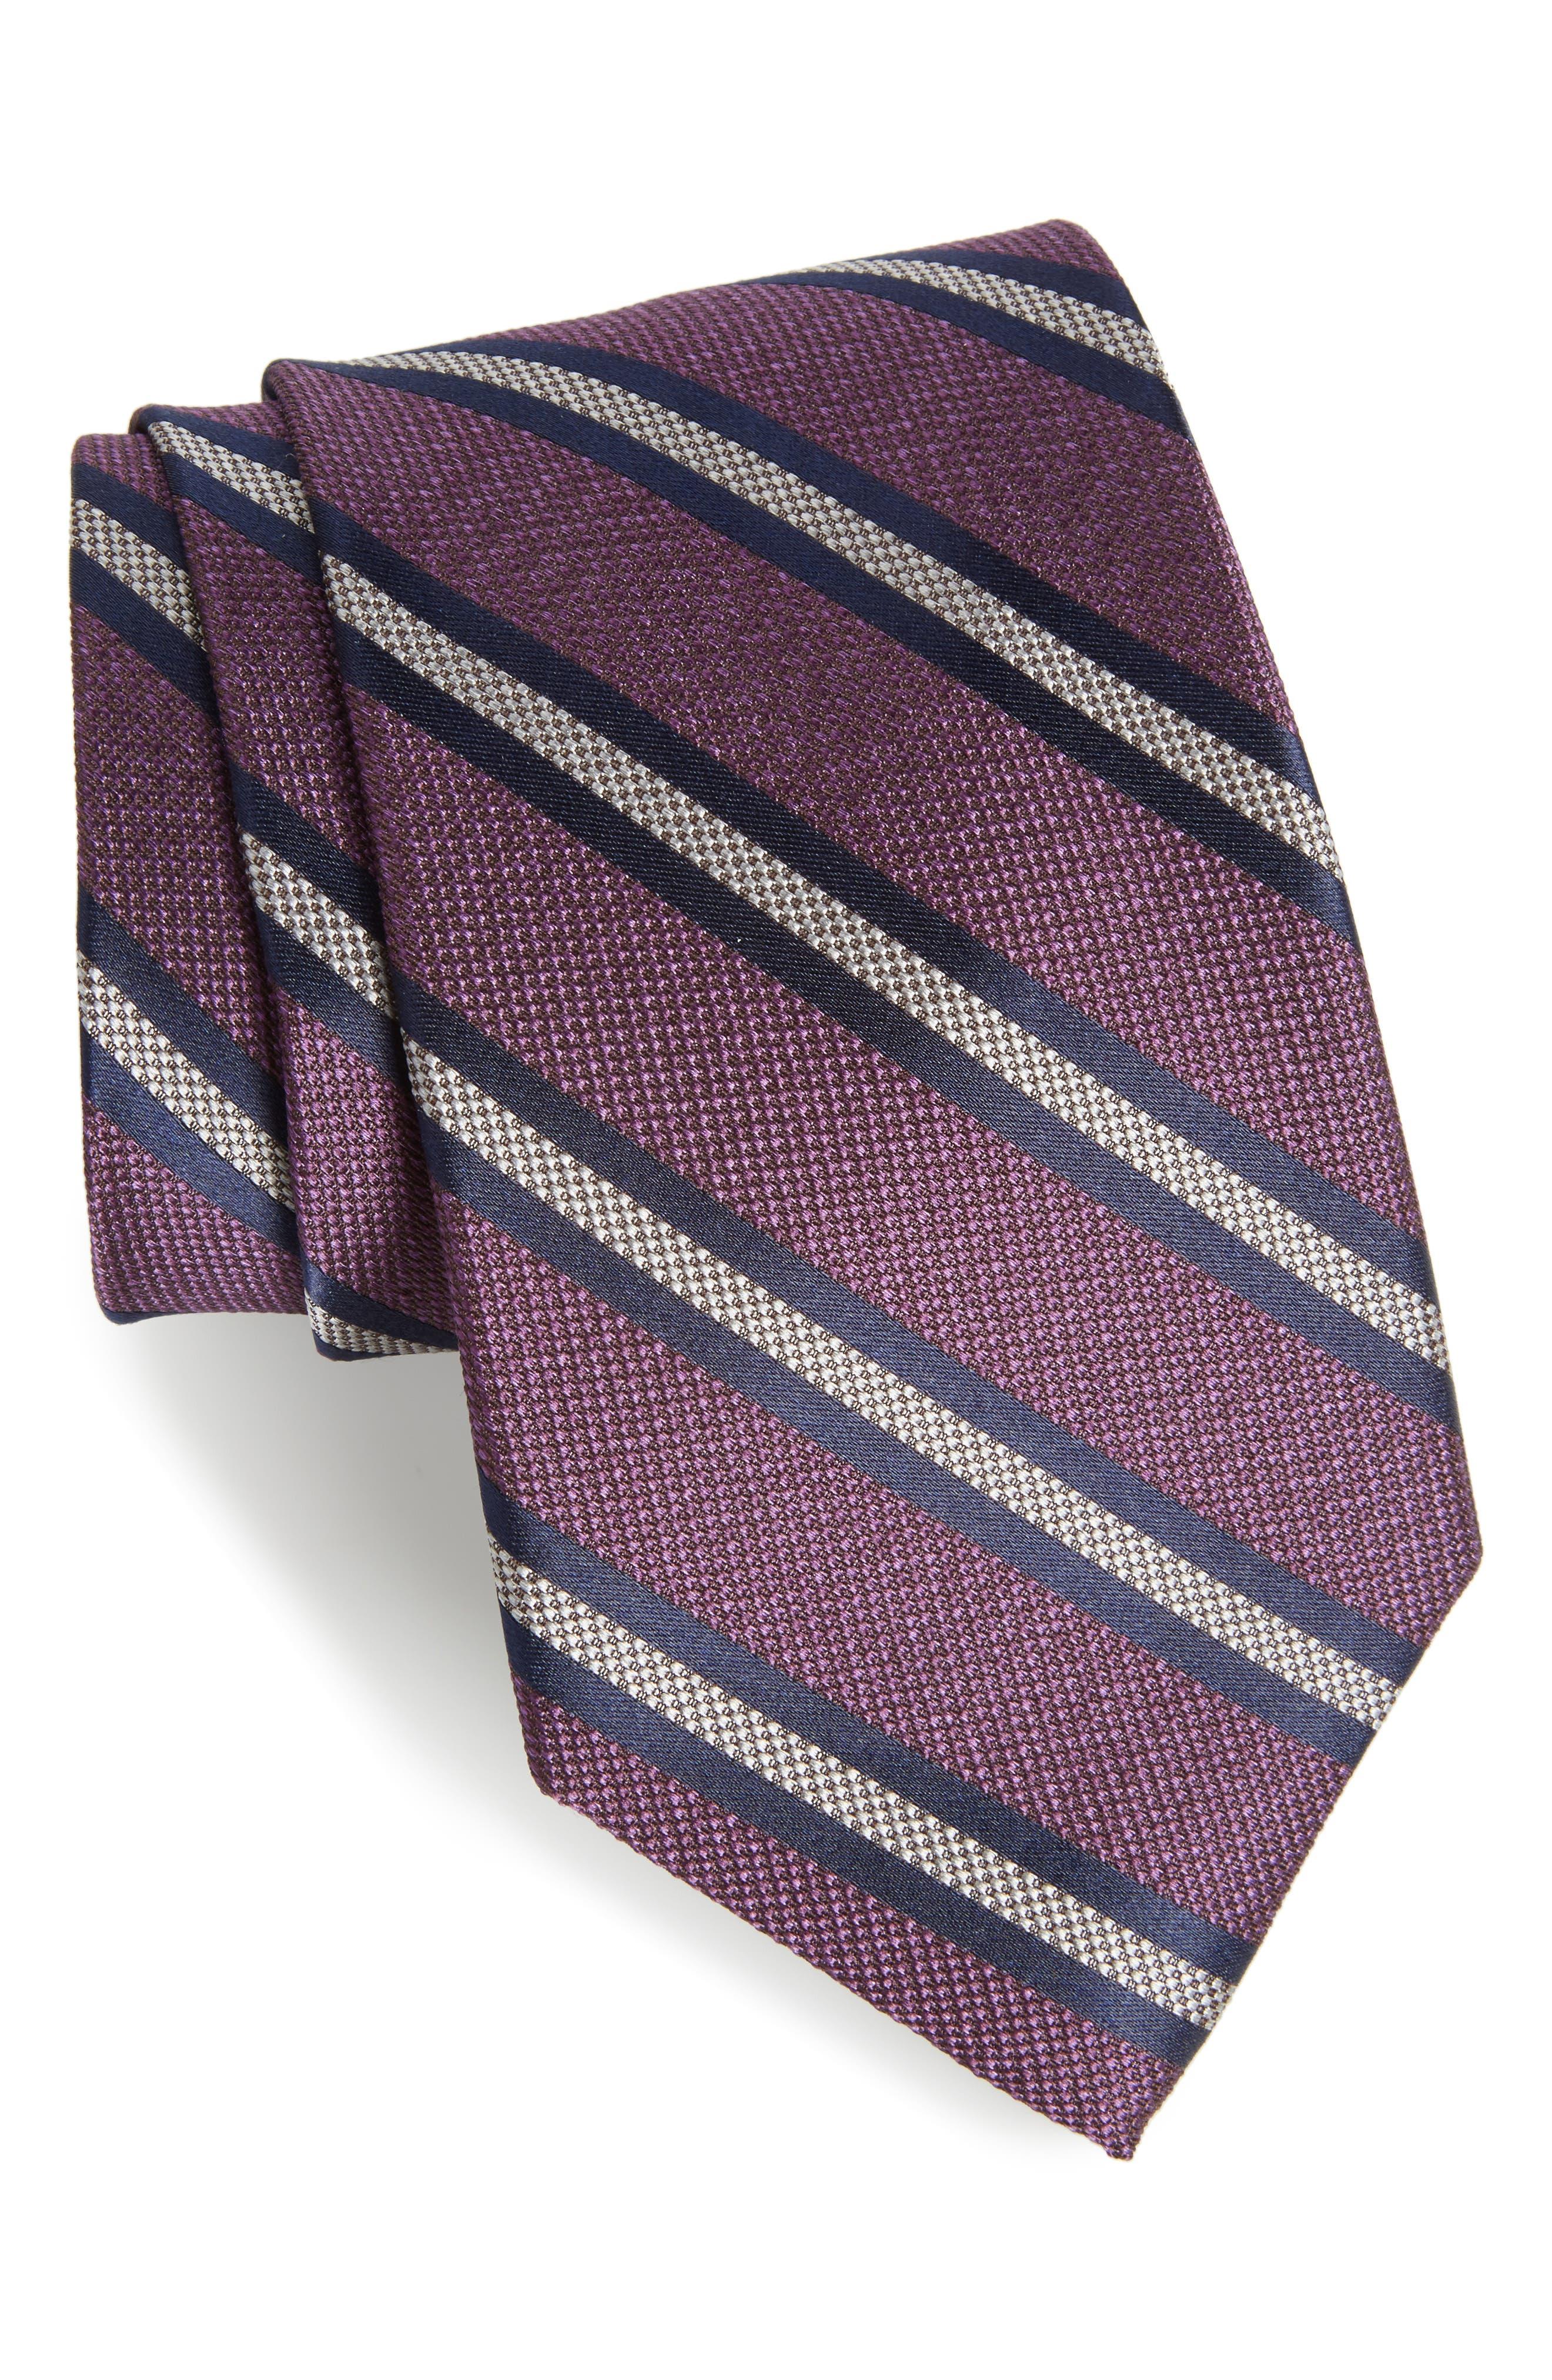 NORDSTROM MENS SHOP Oxford Stripe Silk Tie